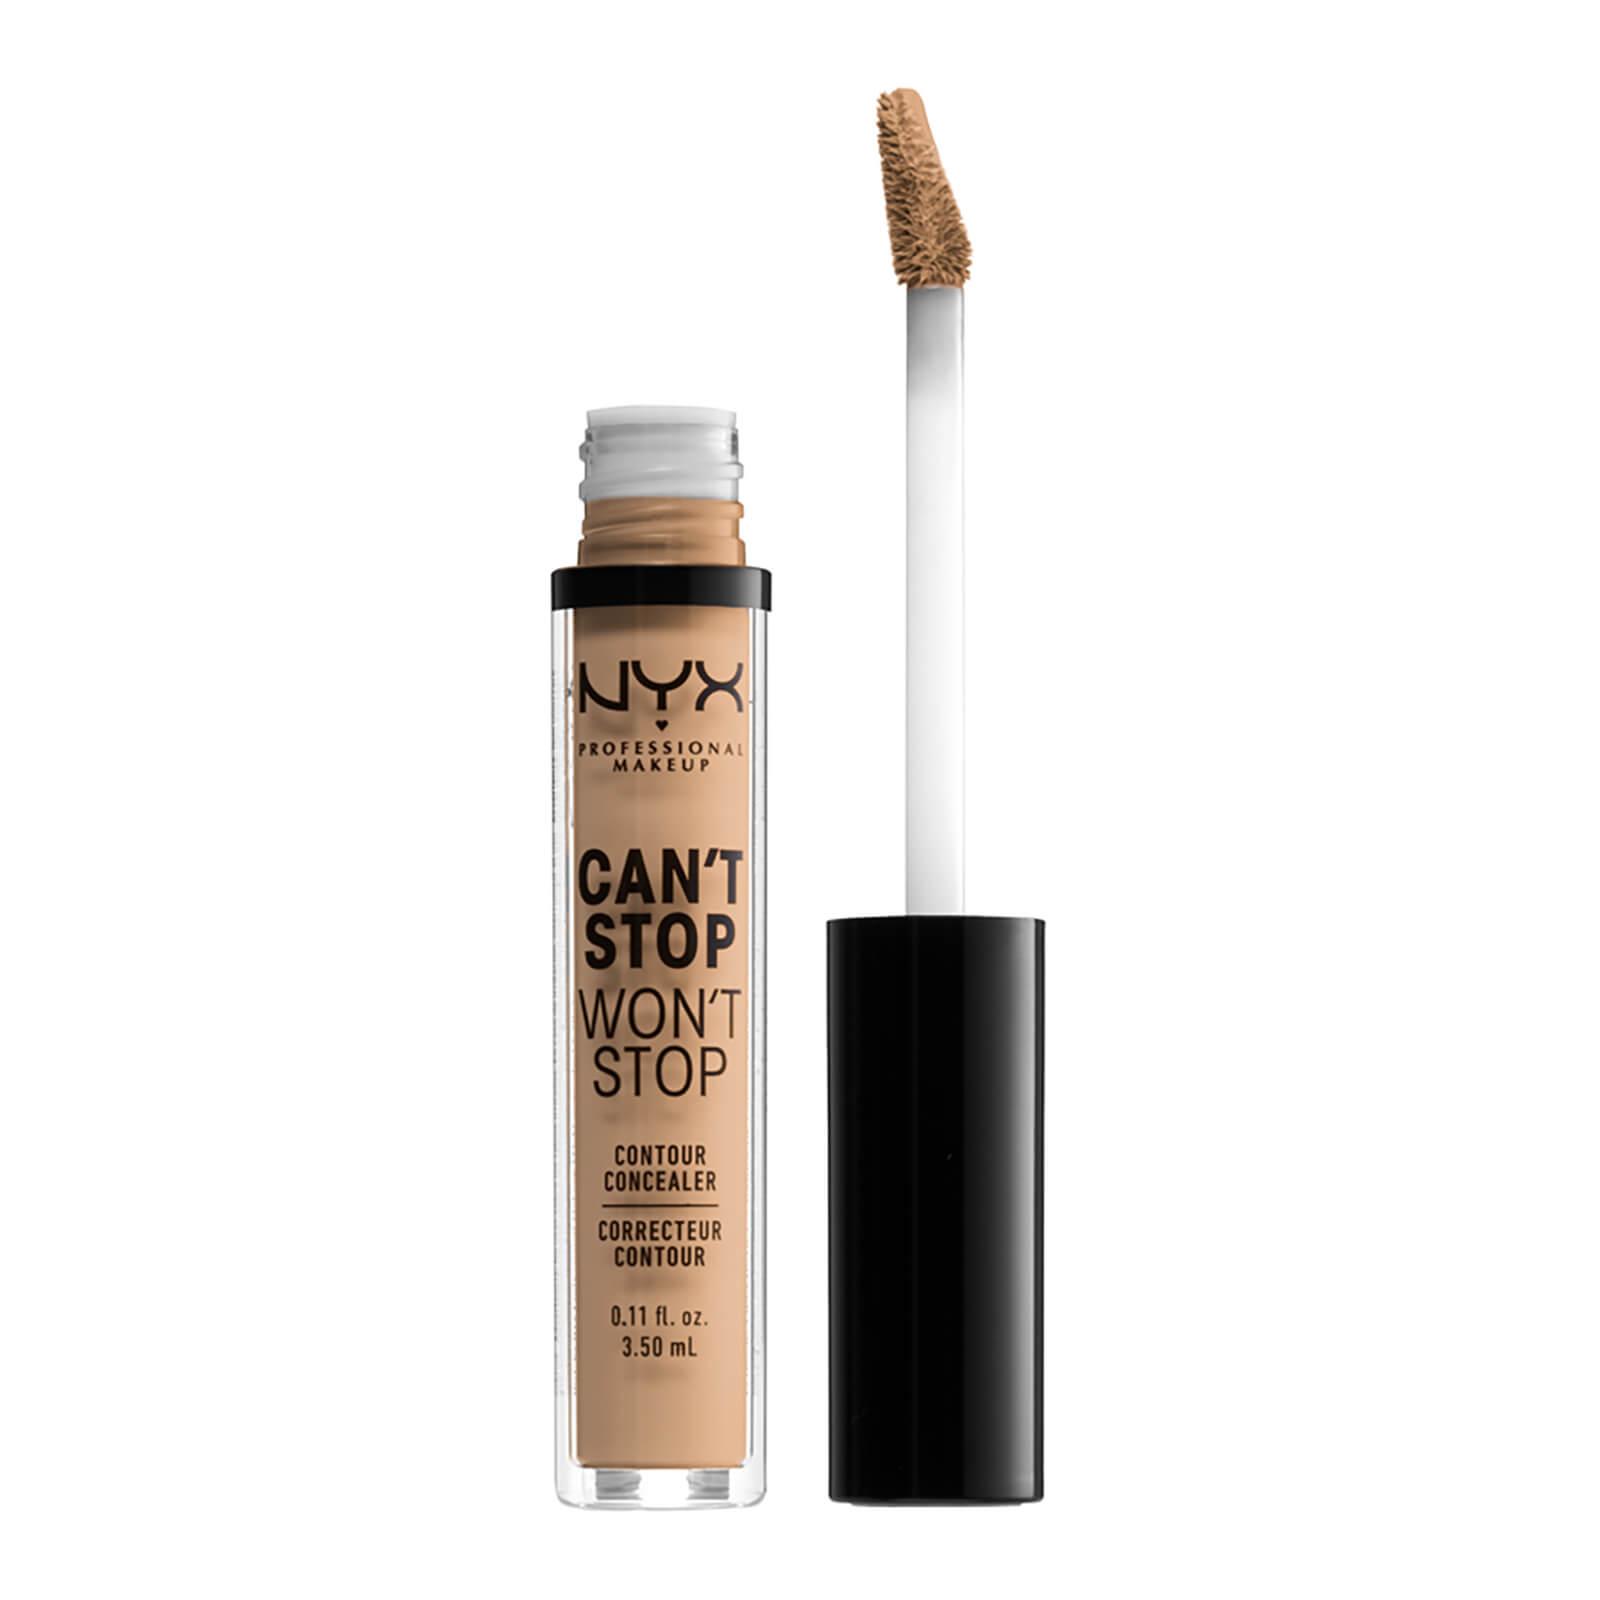 NYX Professional Makeup Can't Stop Won't Stop Contour Concealer (Various Shades) - Medium Olive